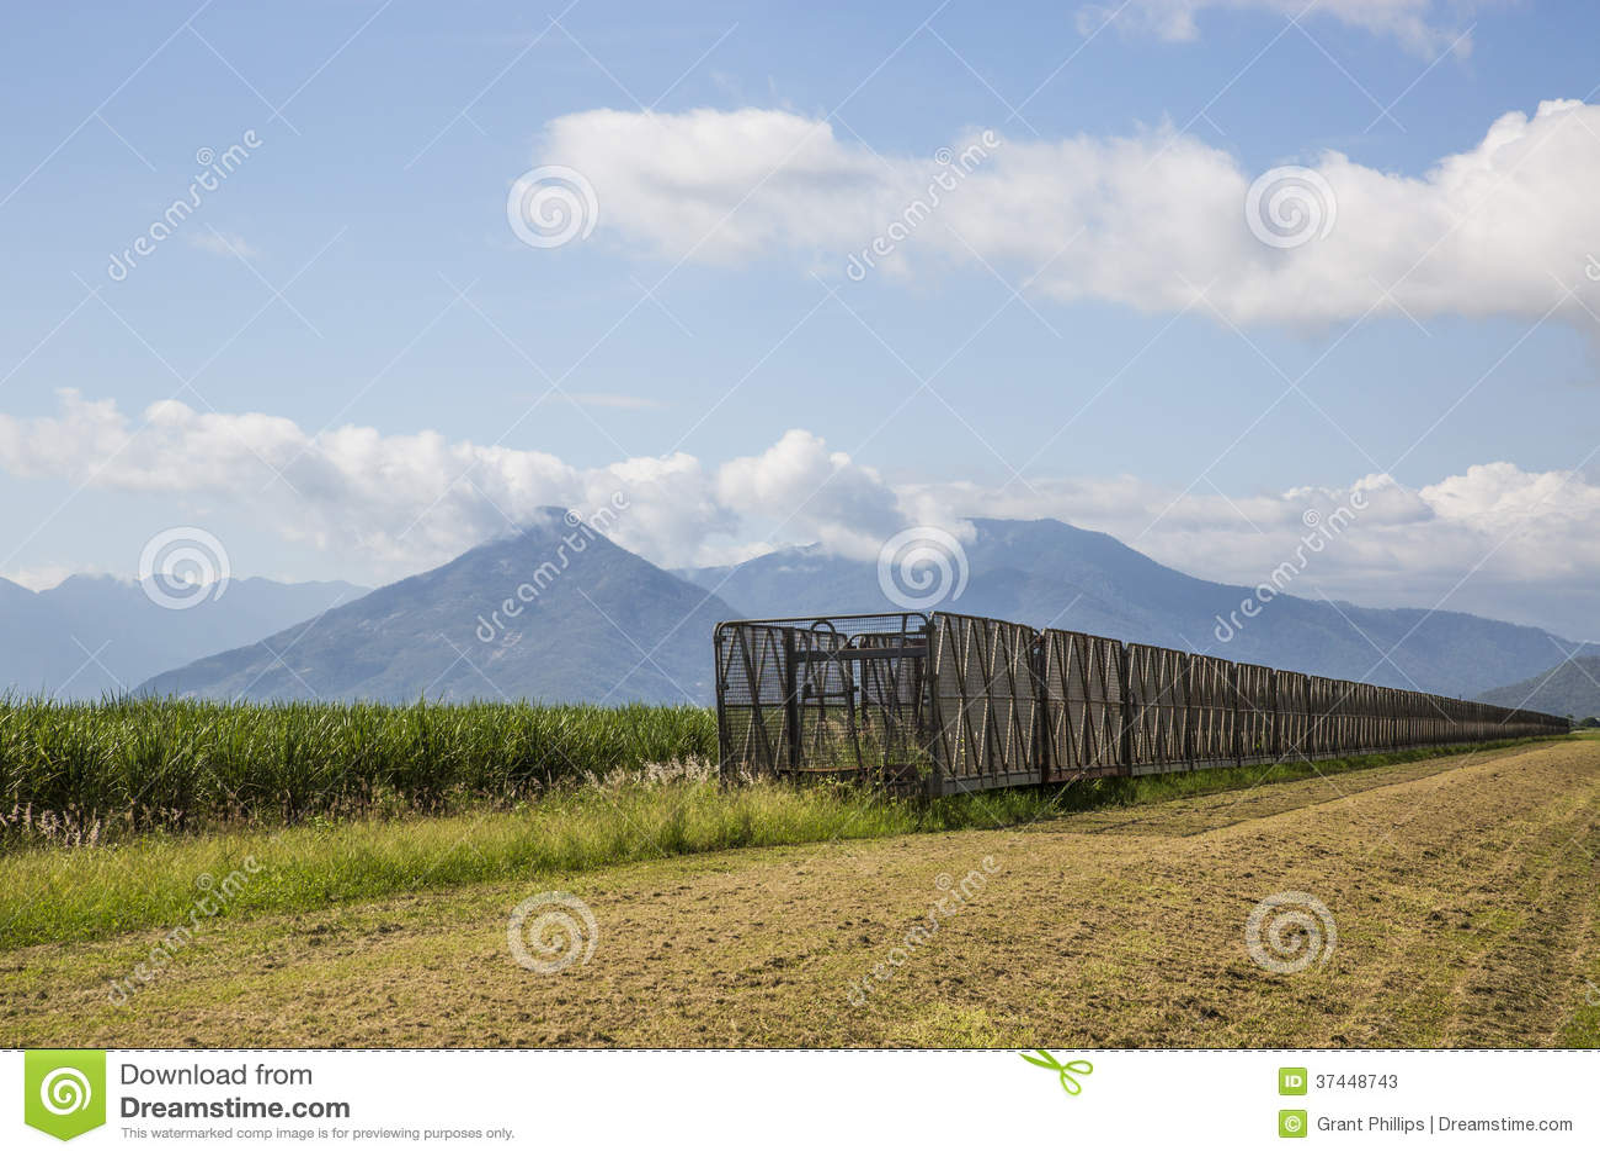 Harvesting Bins & Sugar Cane